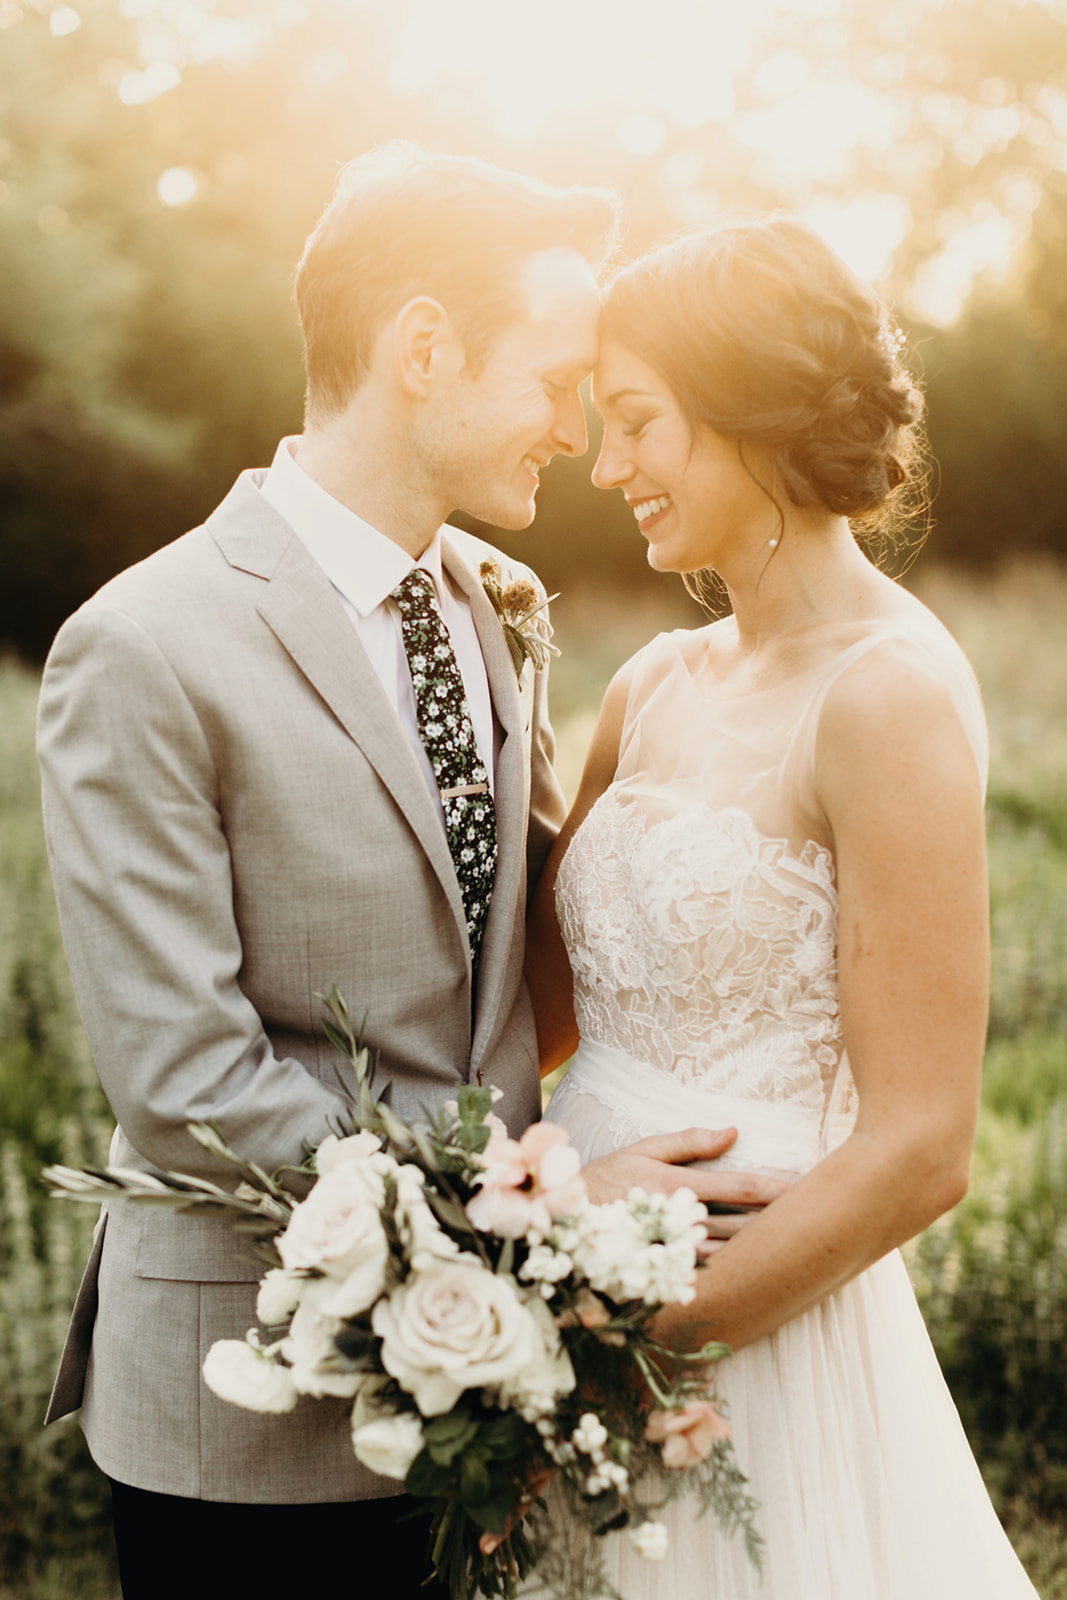 austin-wedding-lindsey-bryce-491.jpg